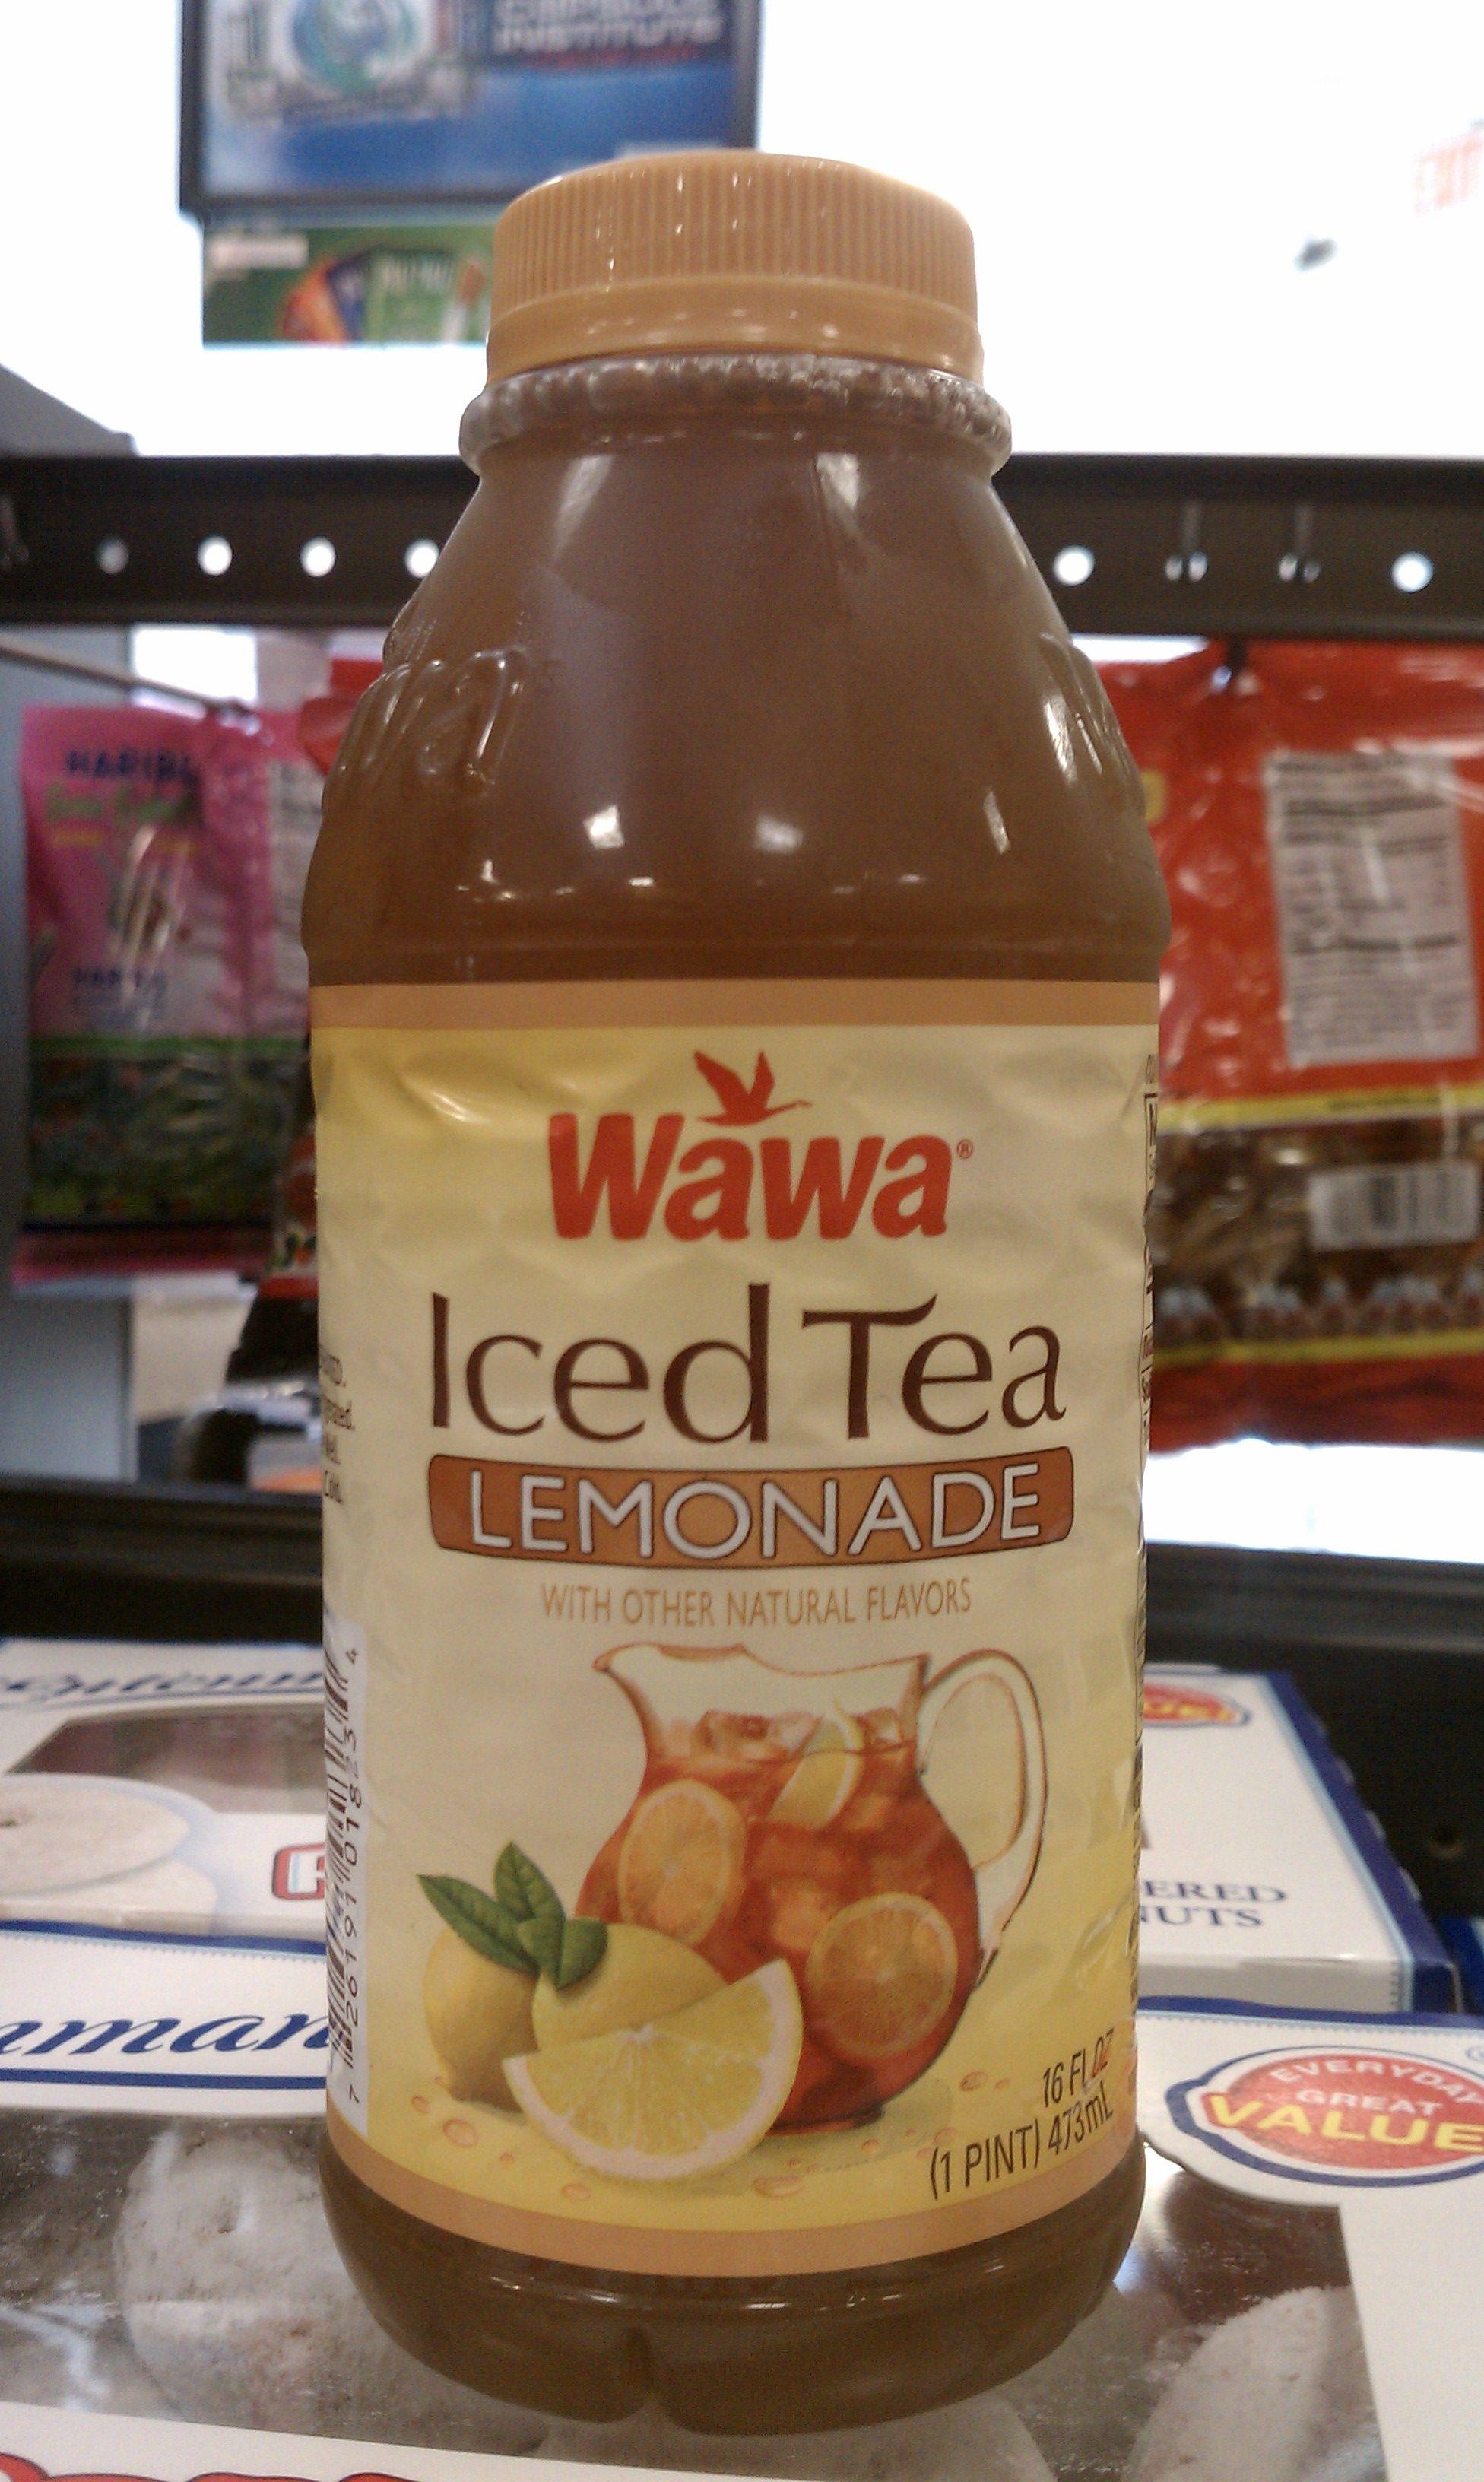 Wawa Iced Tea Lemonade Google Search Iced Tea Lemonade